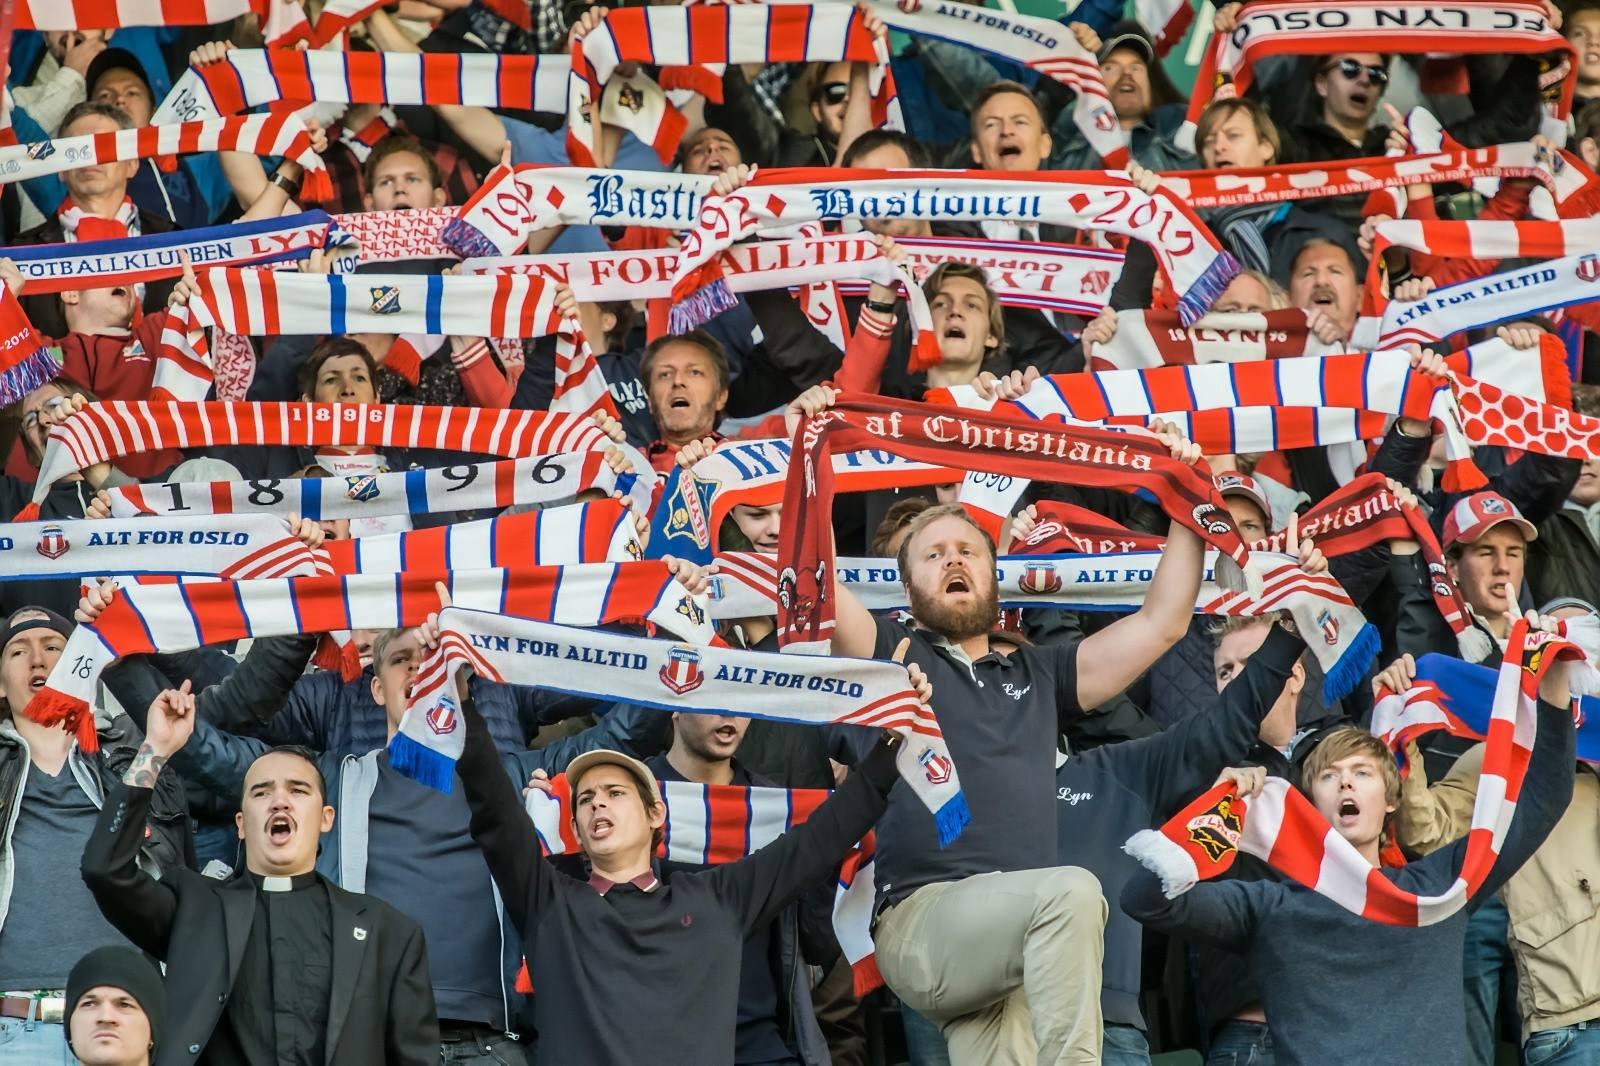 Torsdag 22. juni feires Bastionens 25-årsdag med retroderby på Bislett stadion (foto: Lars Opstad)